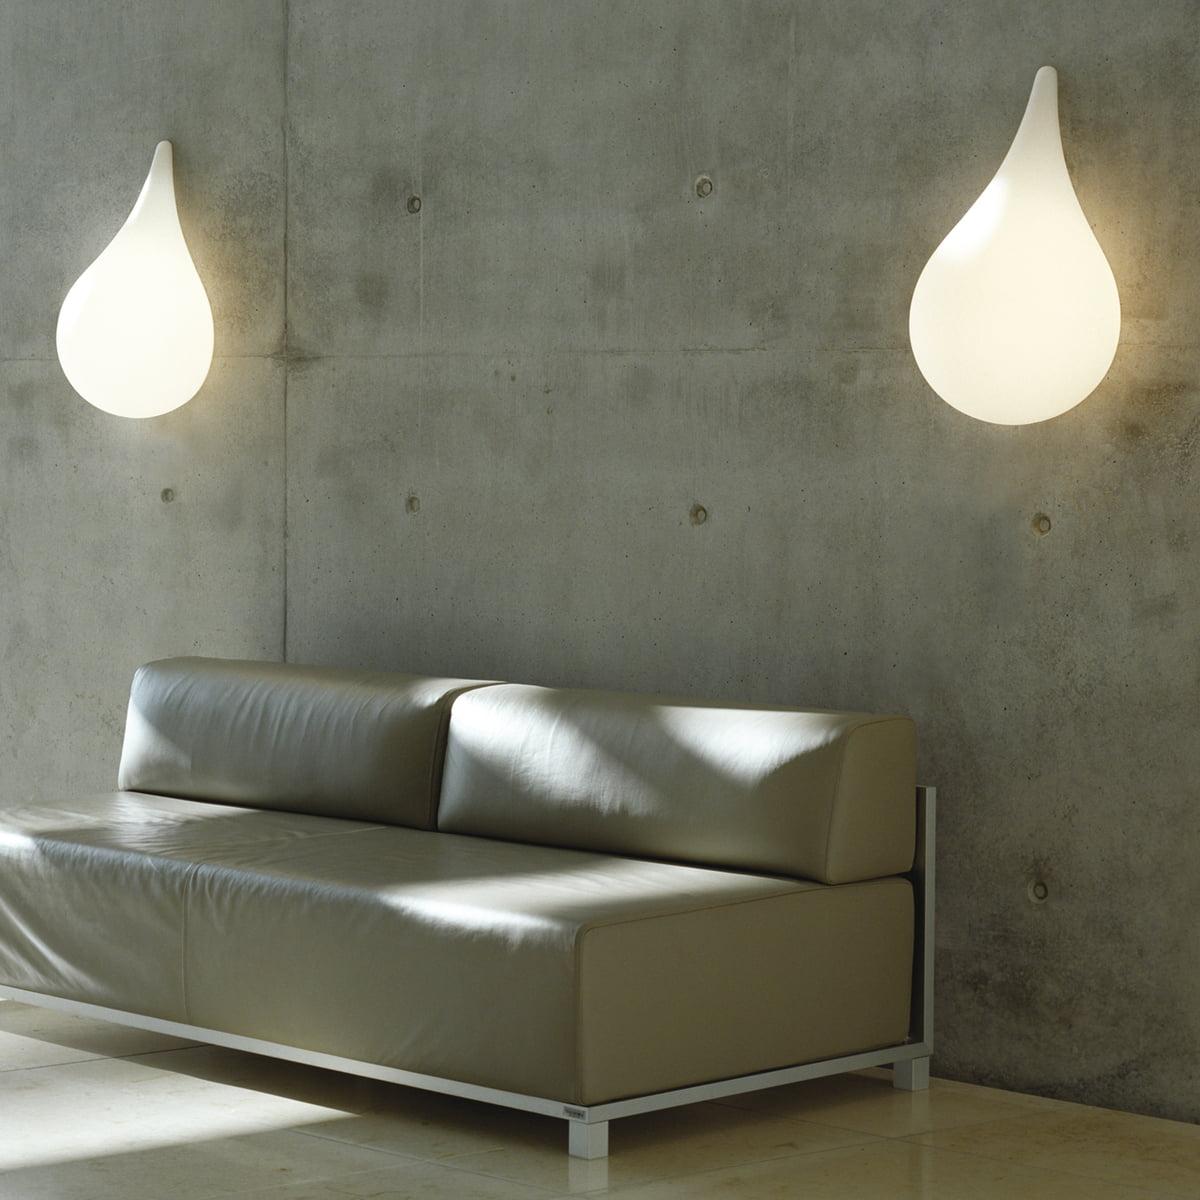 next wall lighting. Next Home - Drop_3 Wall Lamp, Small Next Wall Lighting M